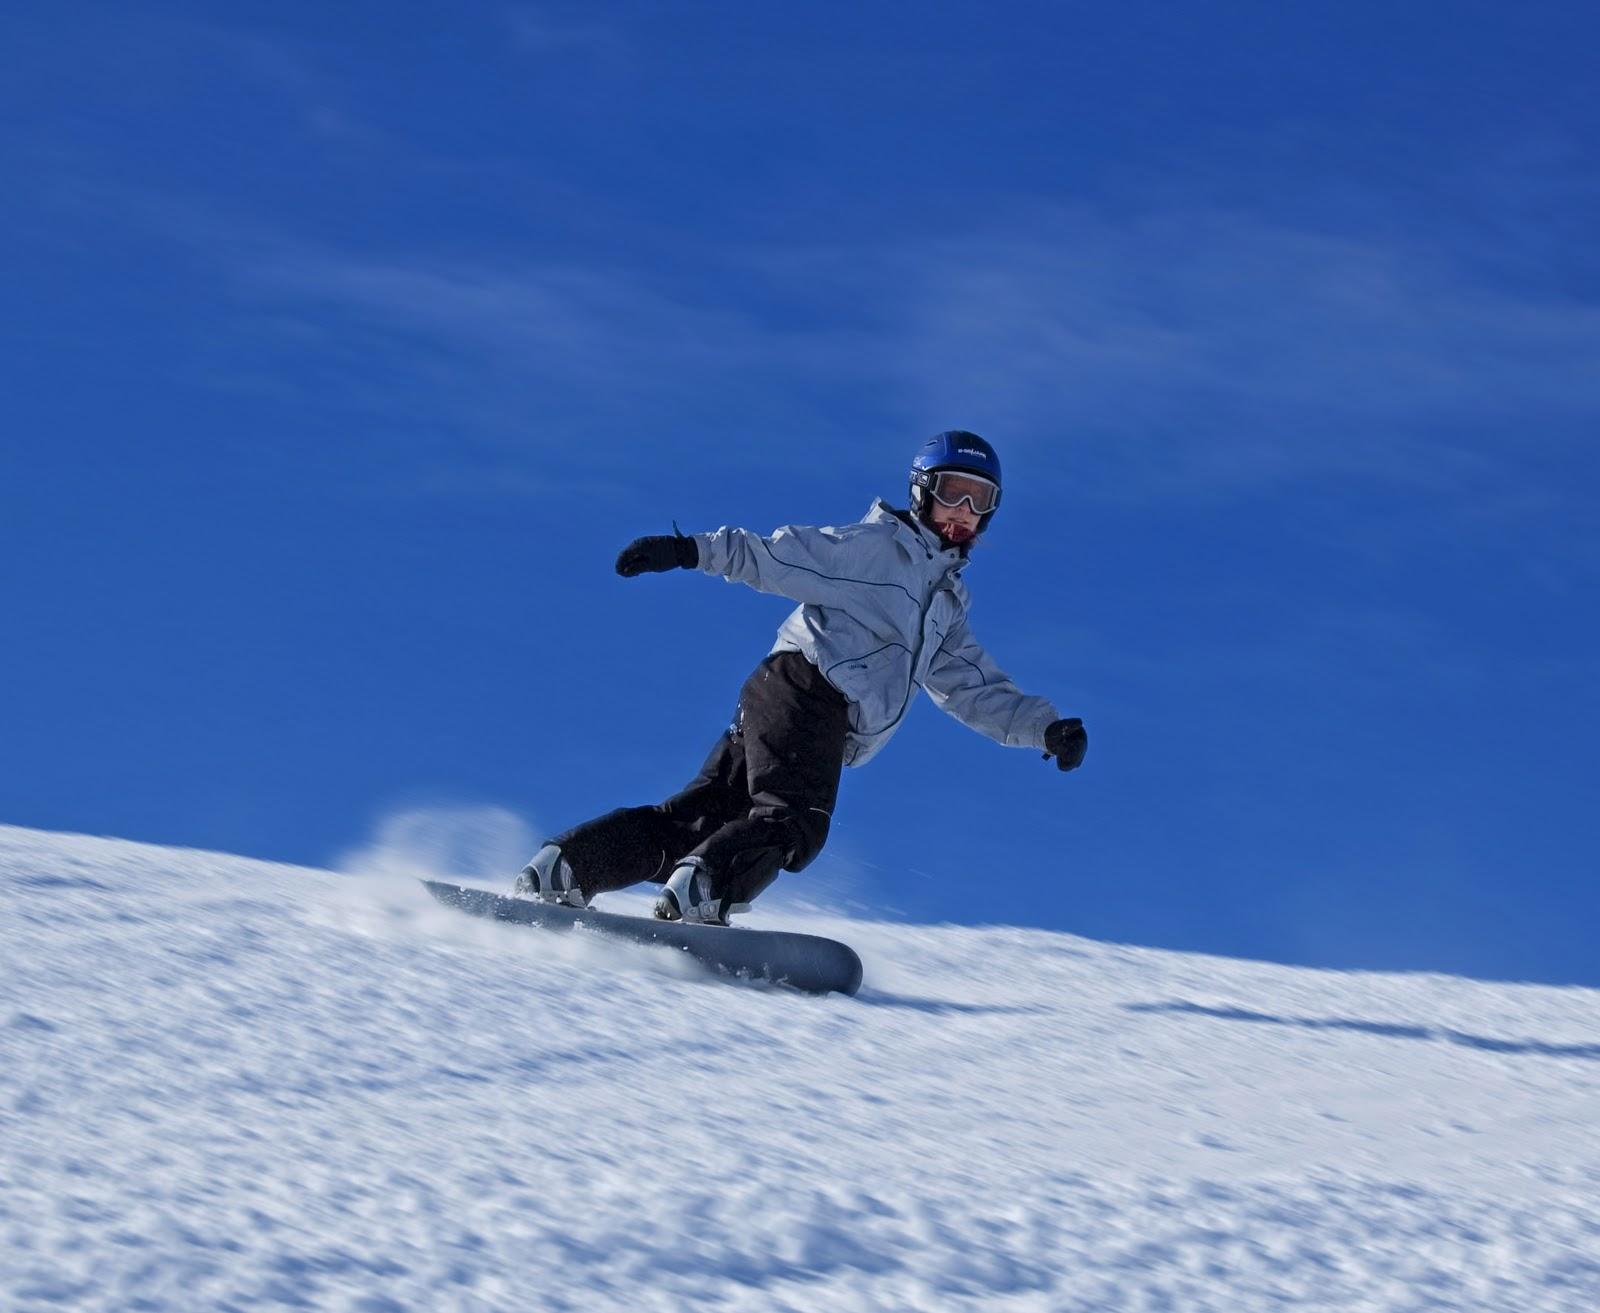 Bucket List - Snowboarding | My Journey